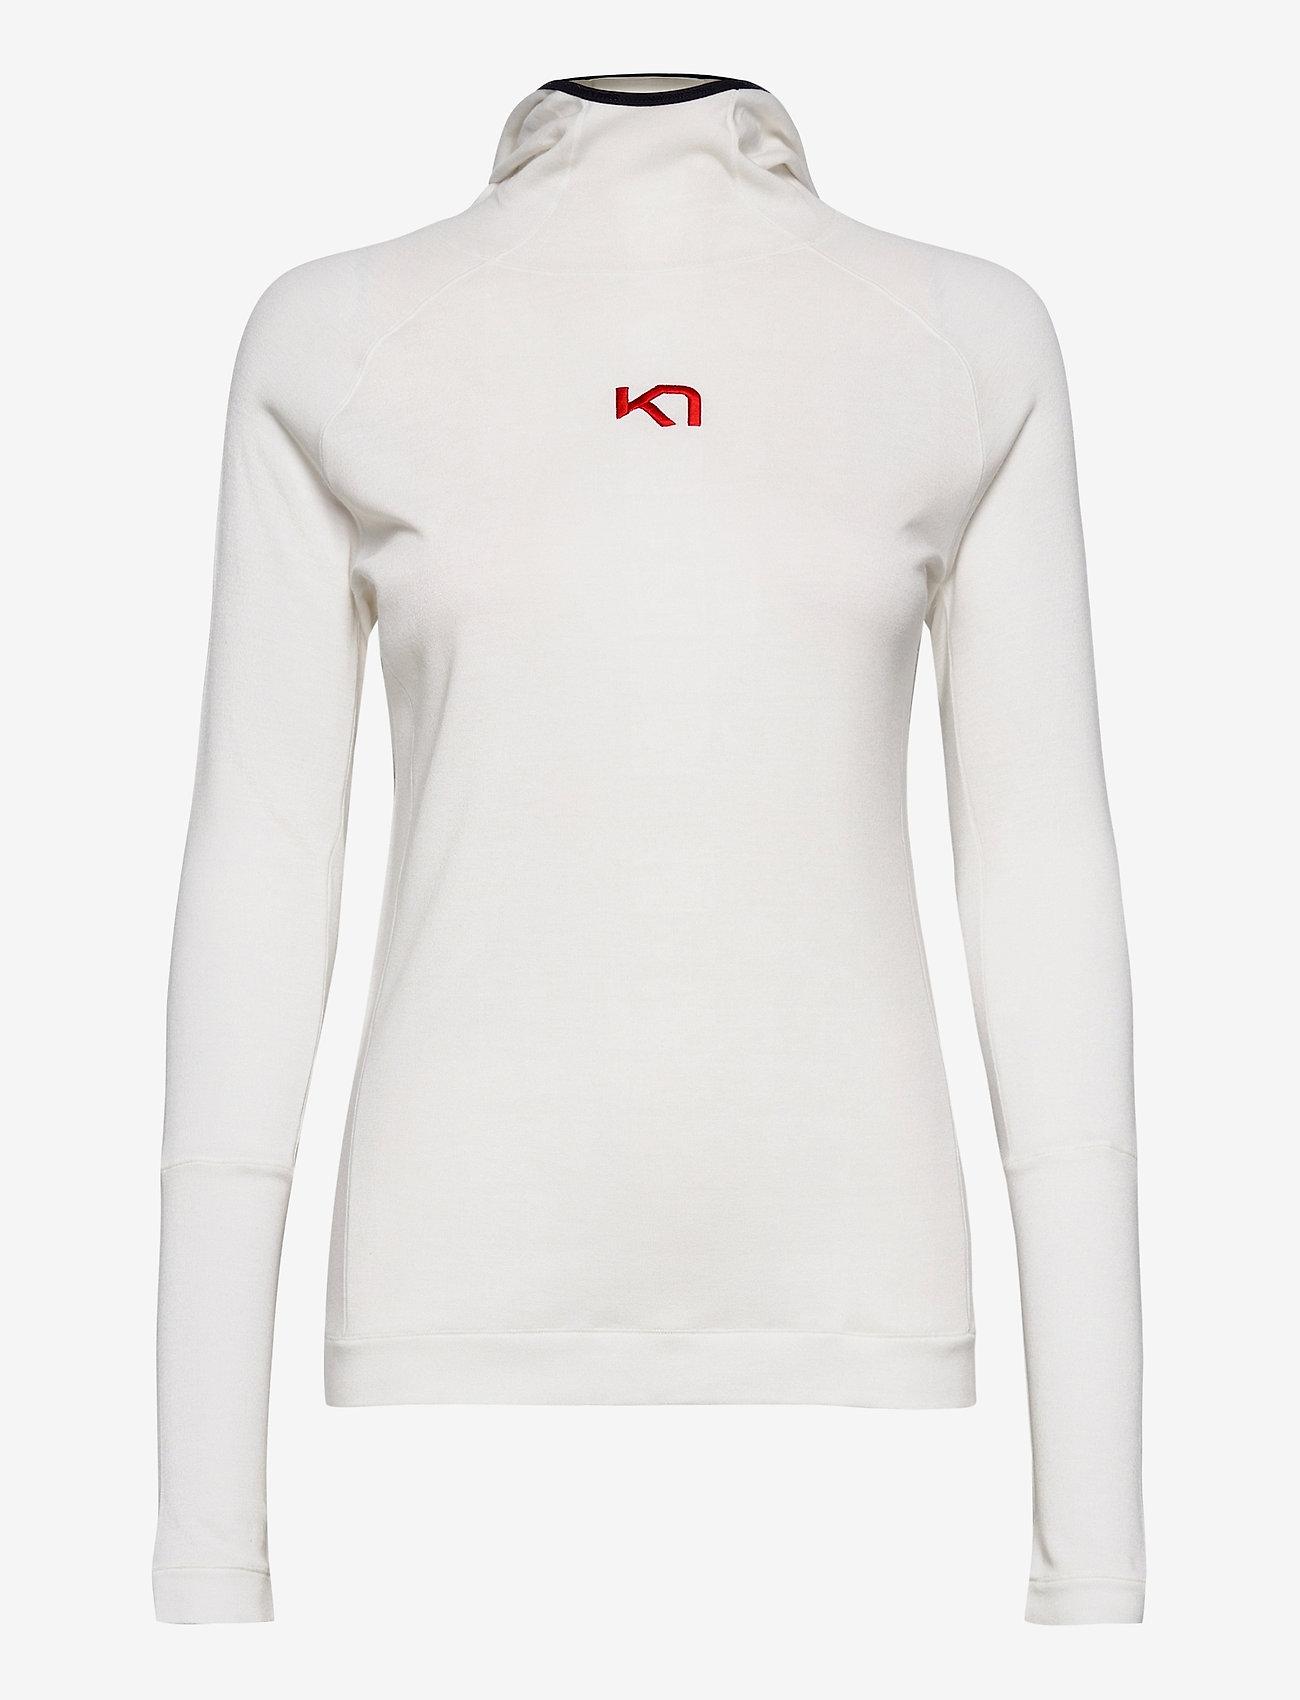 Kari Traa - RULLE HOOD - base layer tops - bwhite - 0